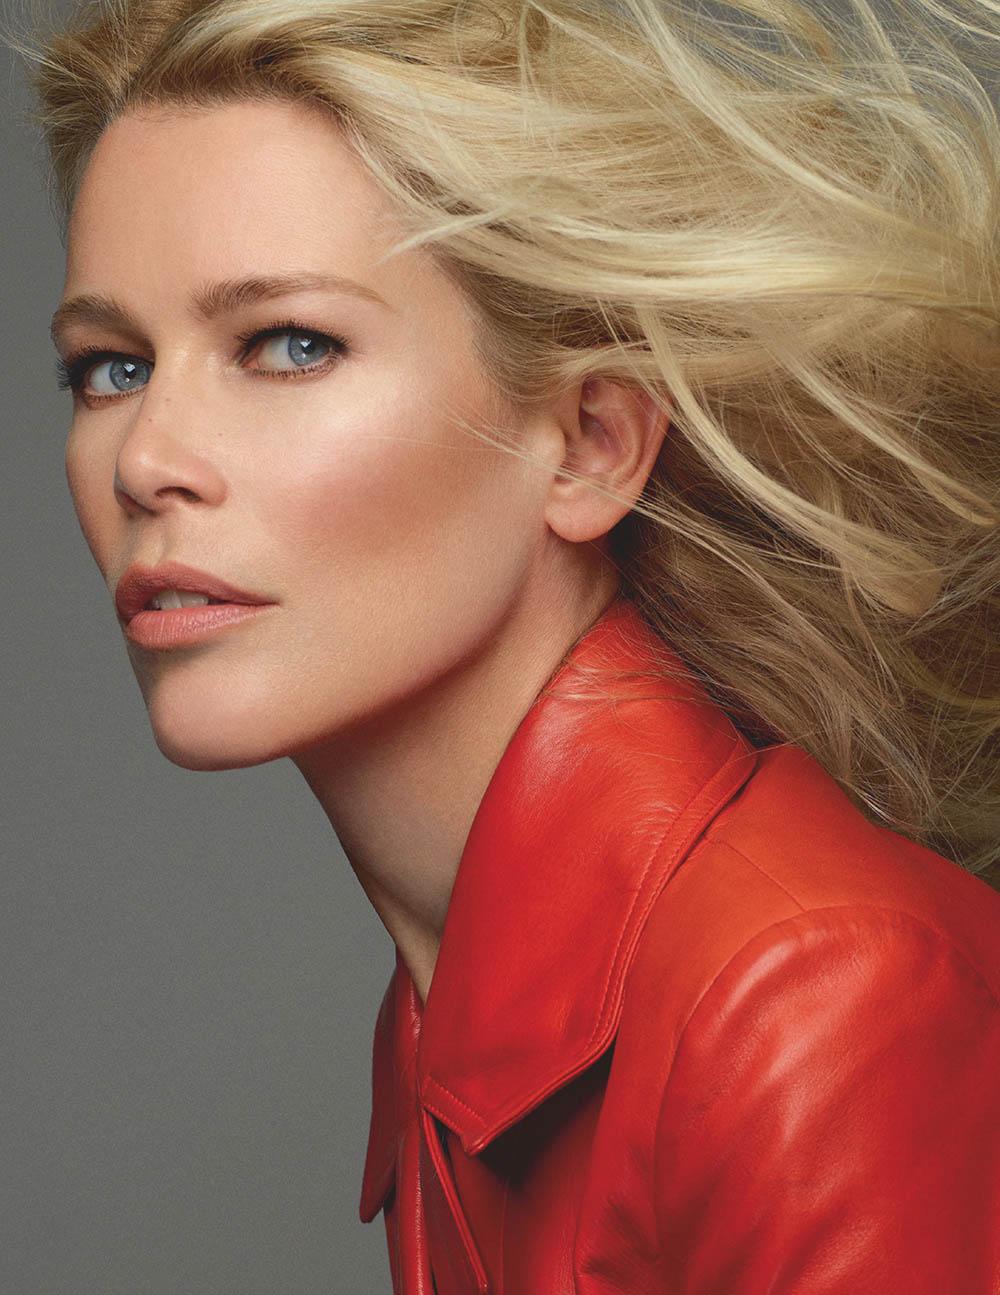 Claudia Schiffer covers Vogue Russia January 2020 by Cuneyt Akeroglu